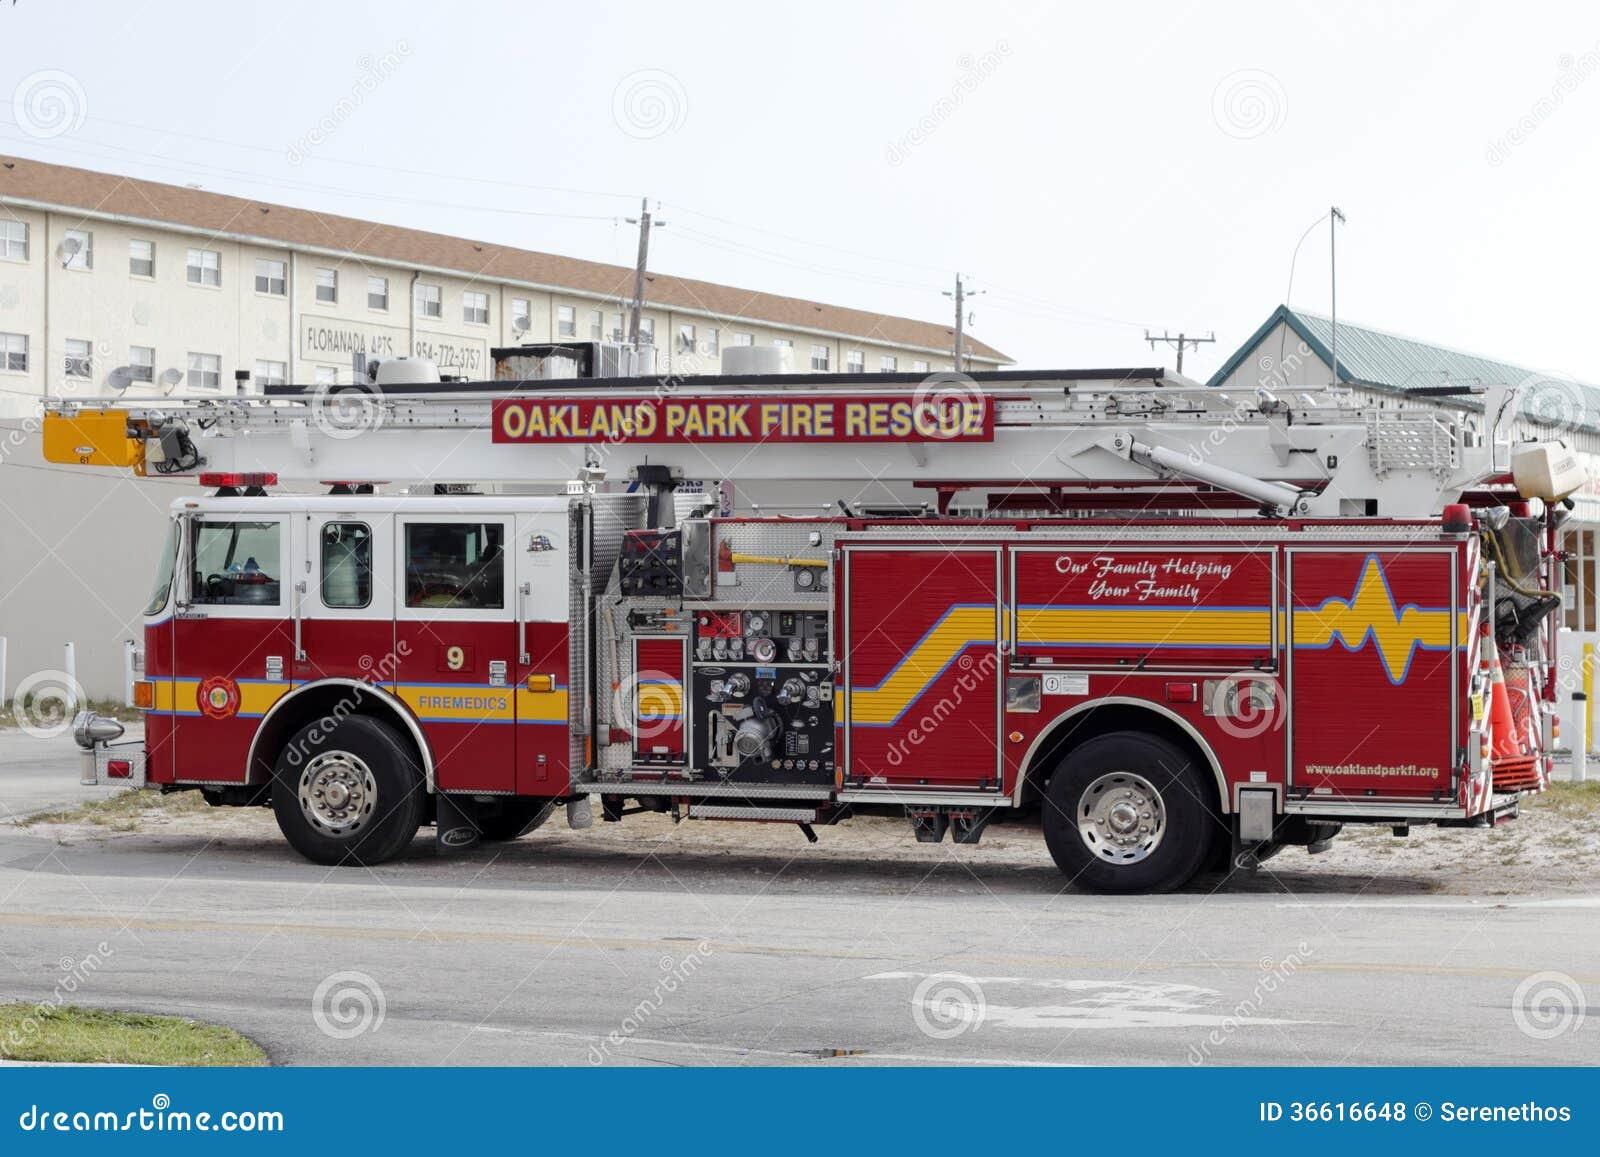 Oakland Park Fire Rescue Truck Editorial Stock Photo